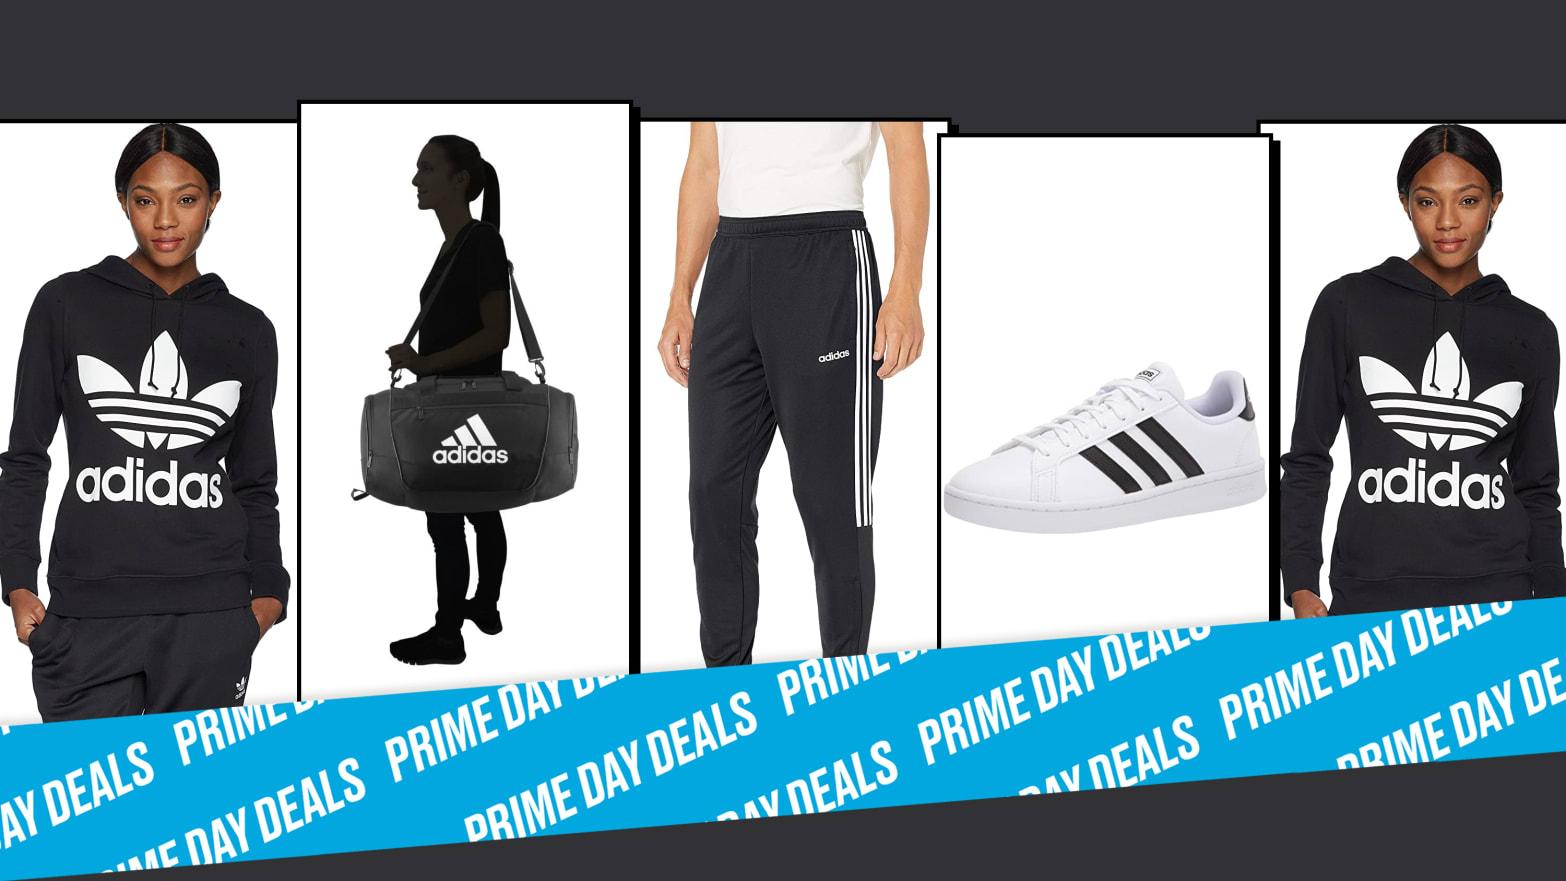 rango maquinilla de afeitar colorante  Adidas Amazon Prime Day Sale